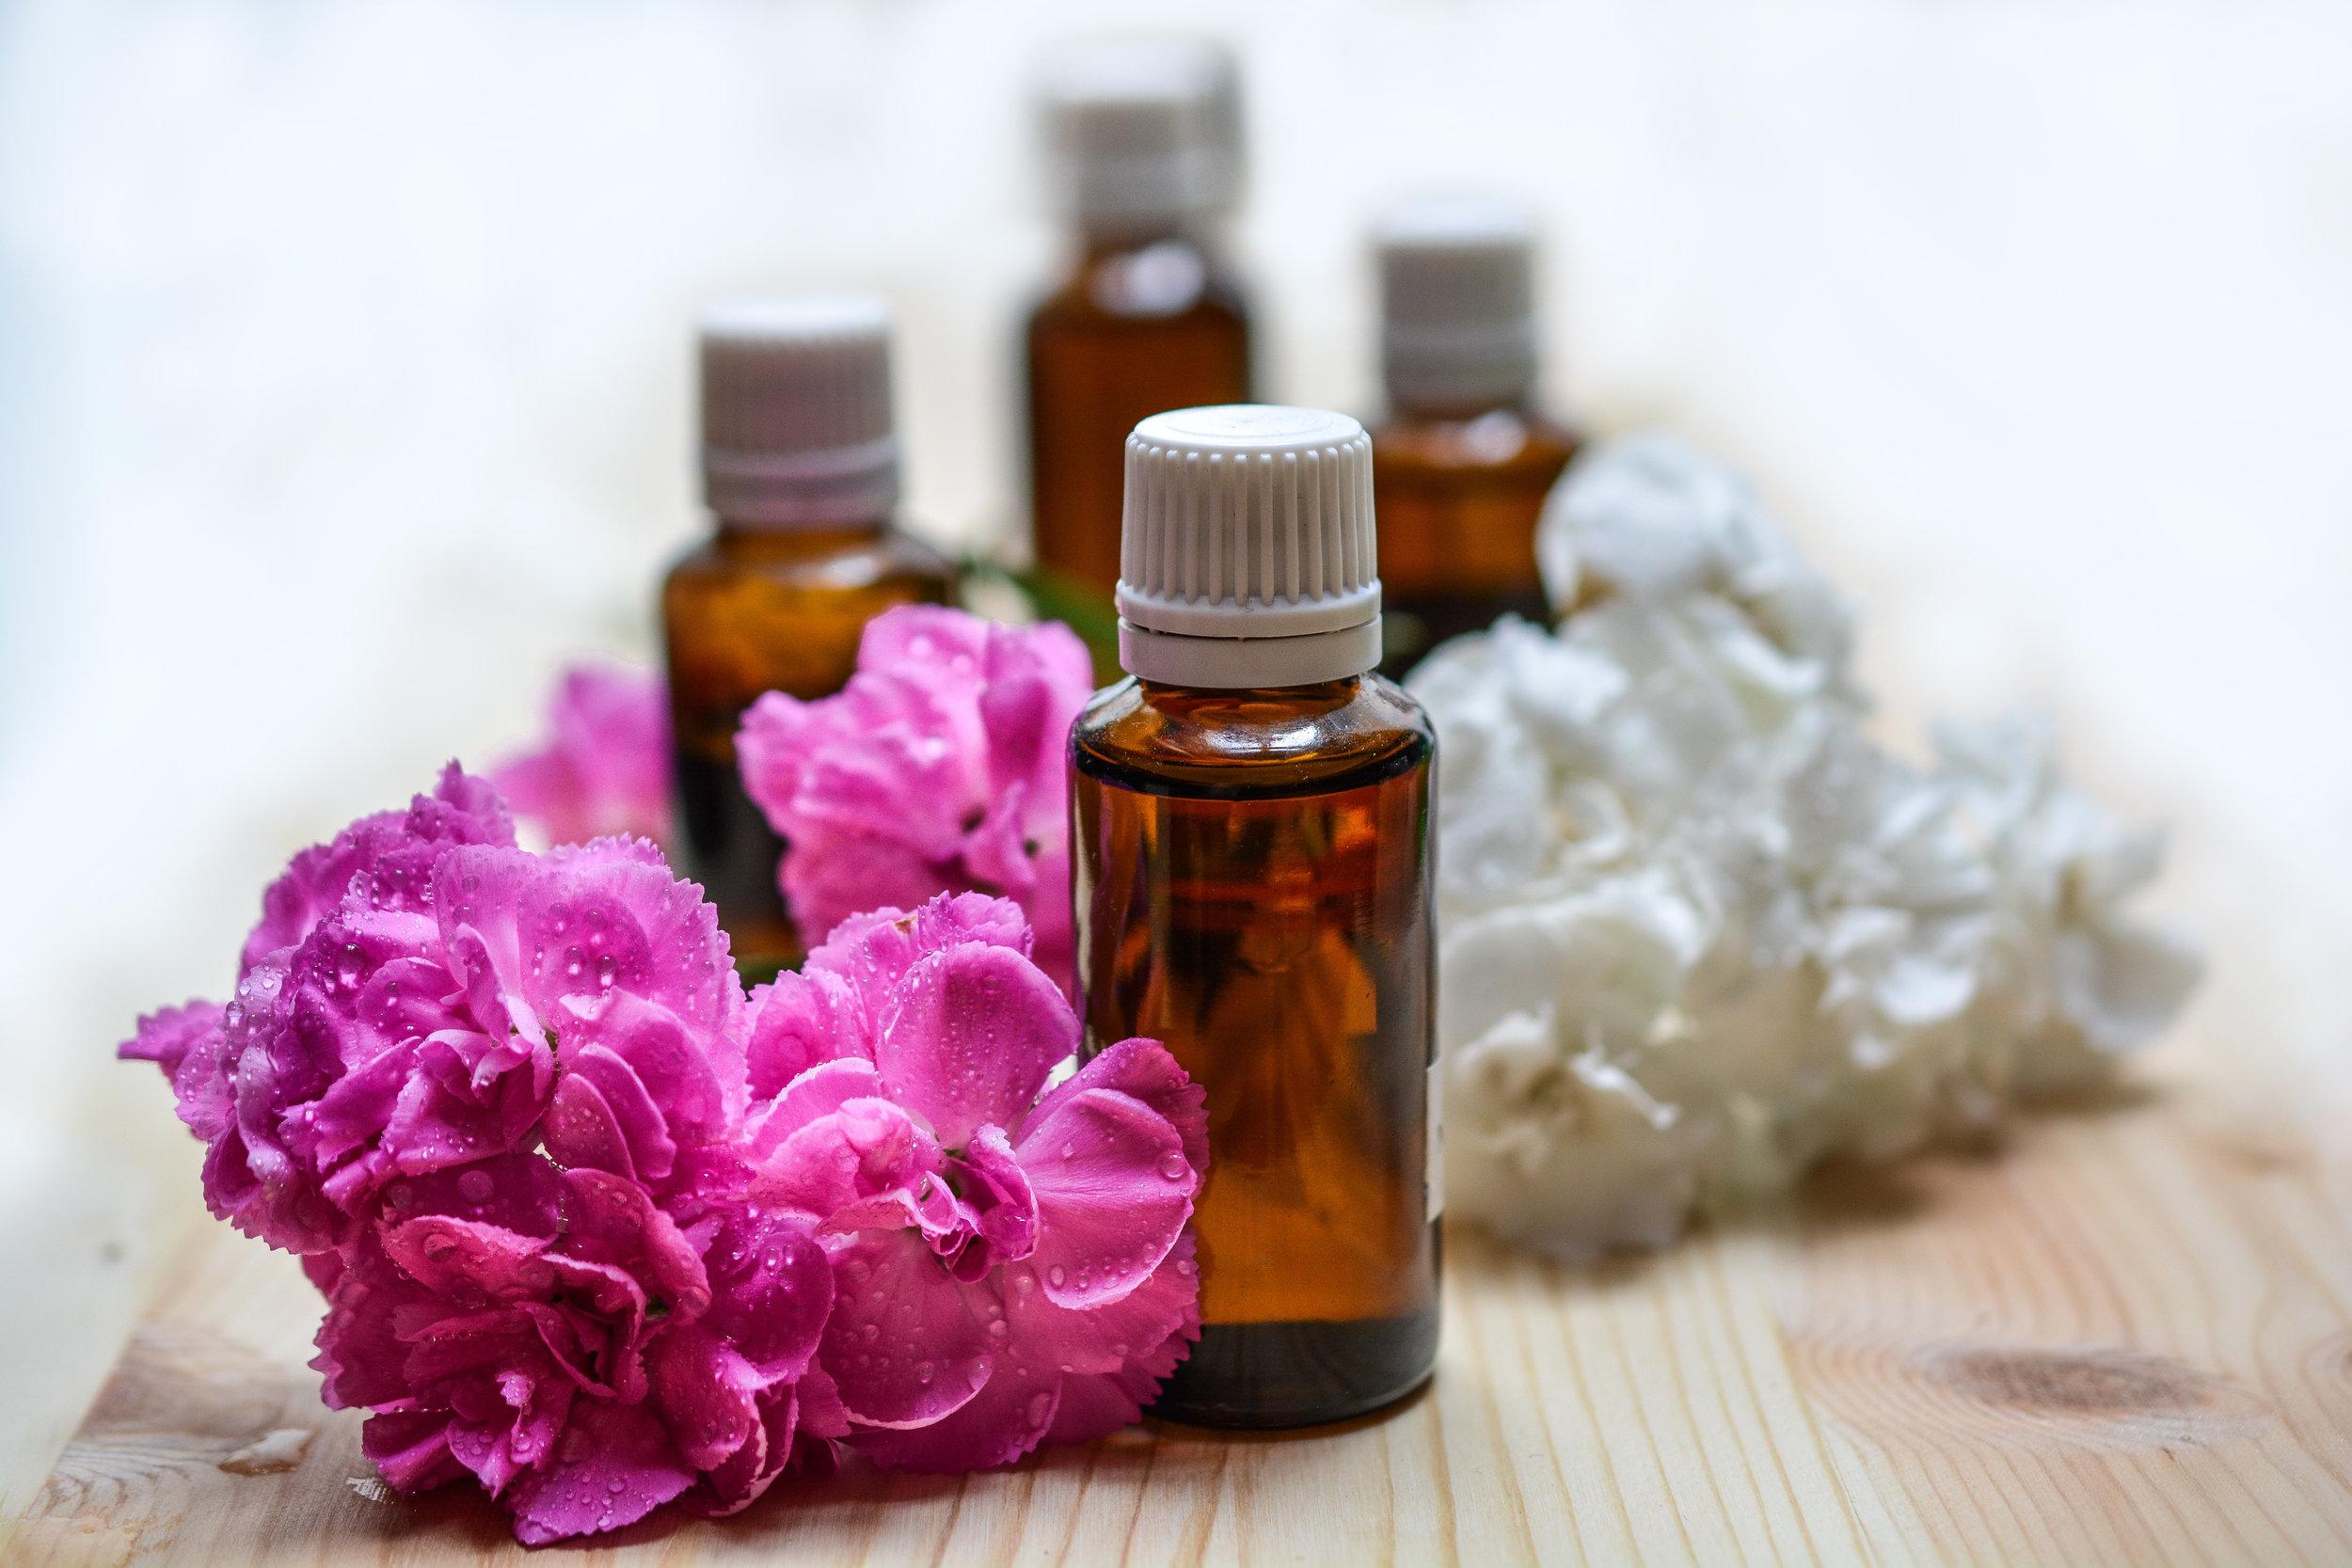 massage oil & flowers.jpg